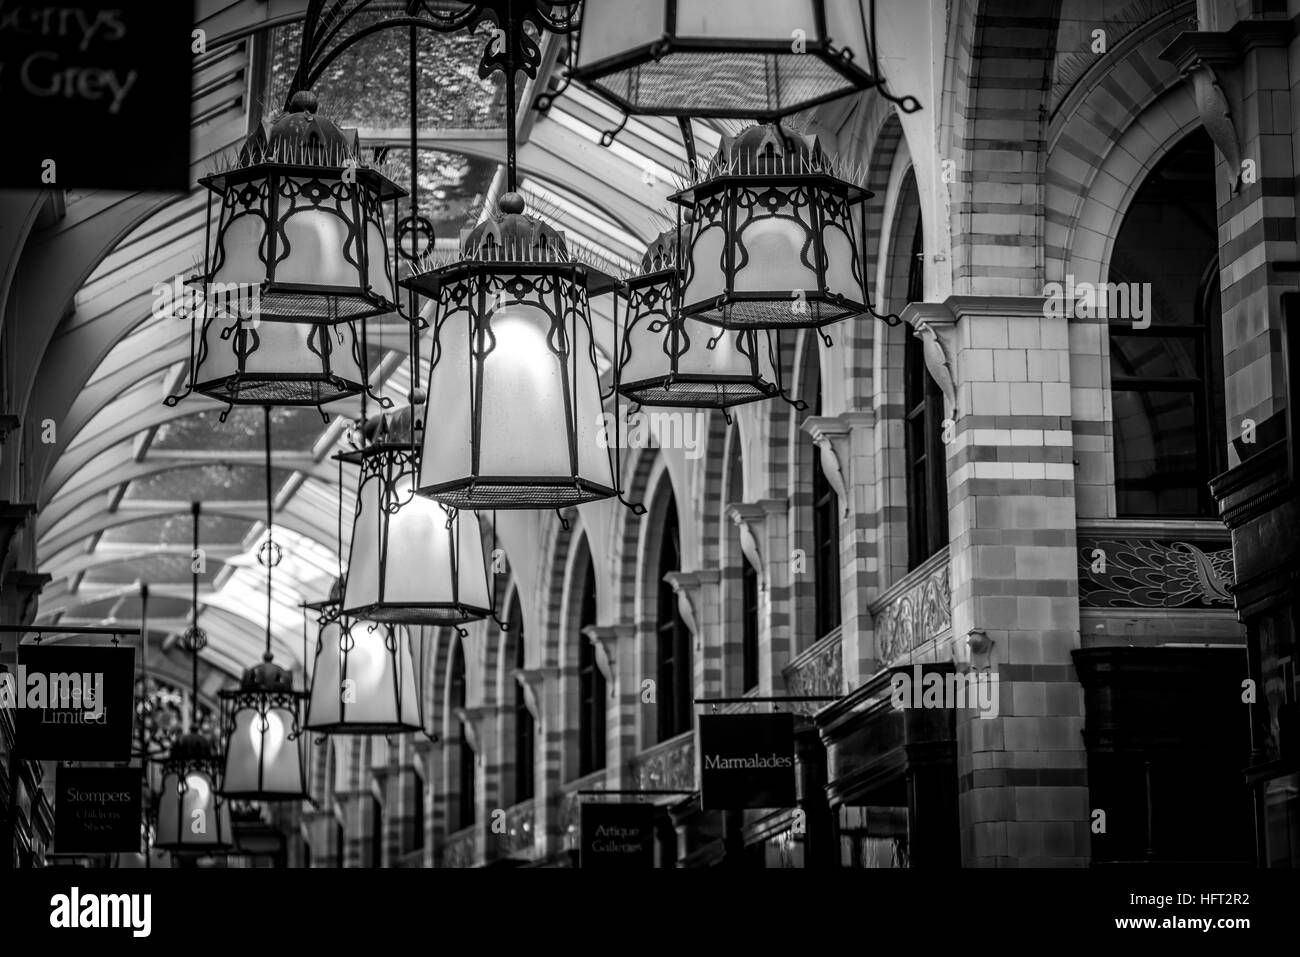 Royal Arcade hanging lights - Stock Image